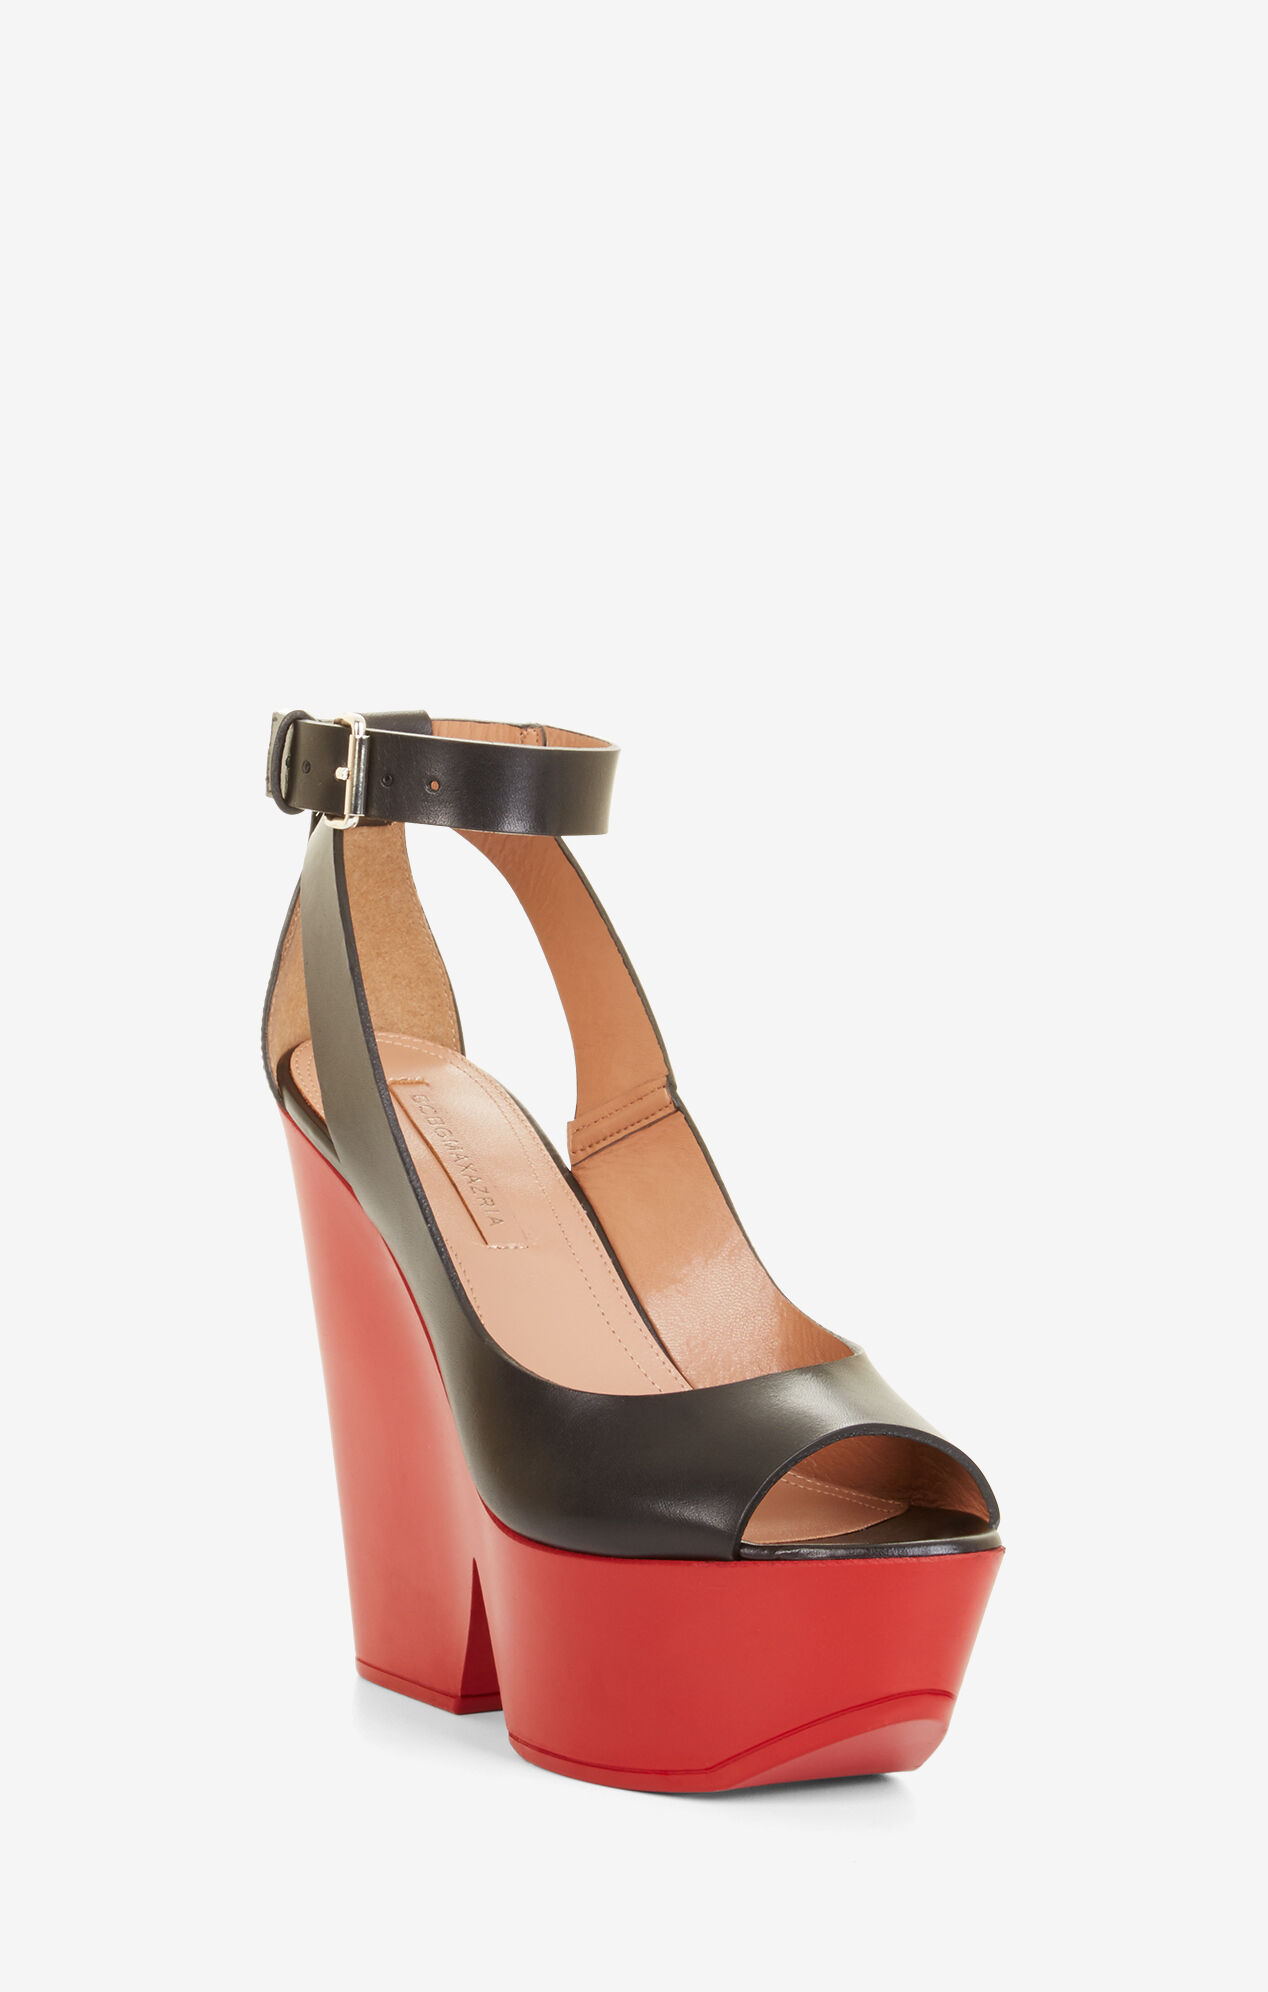 Kyara Leather Wedge Sandals